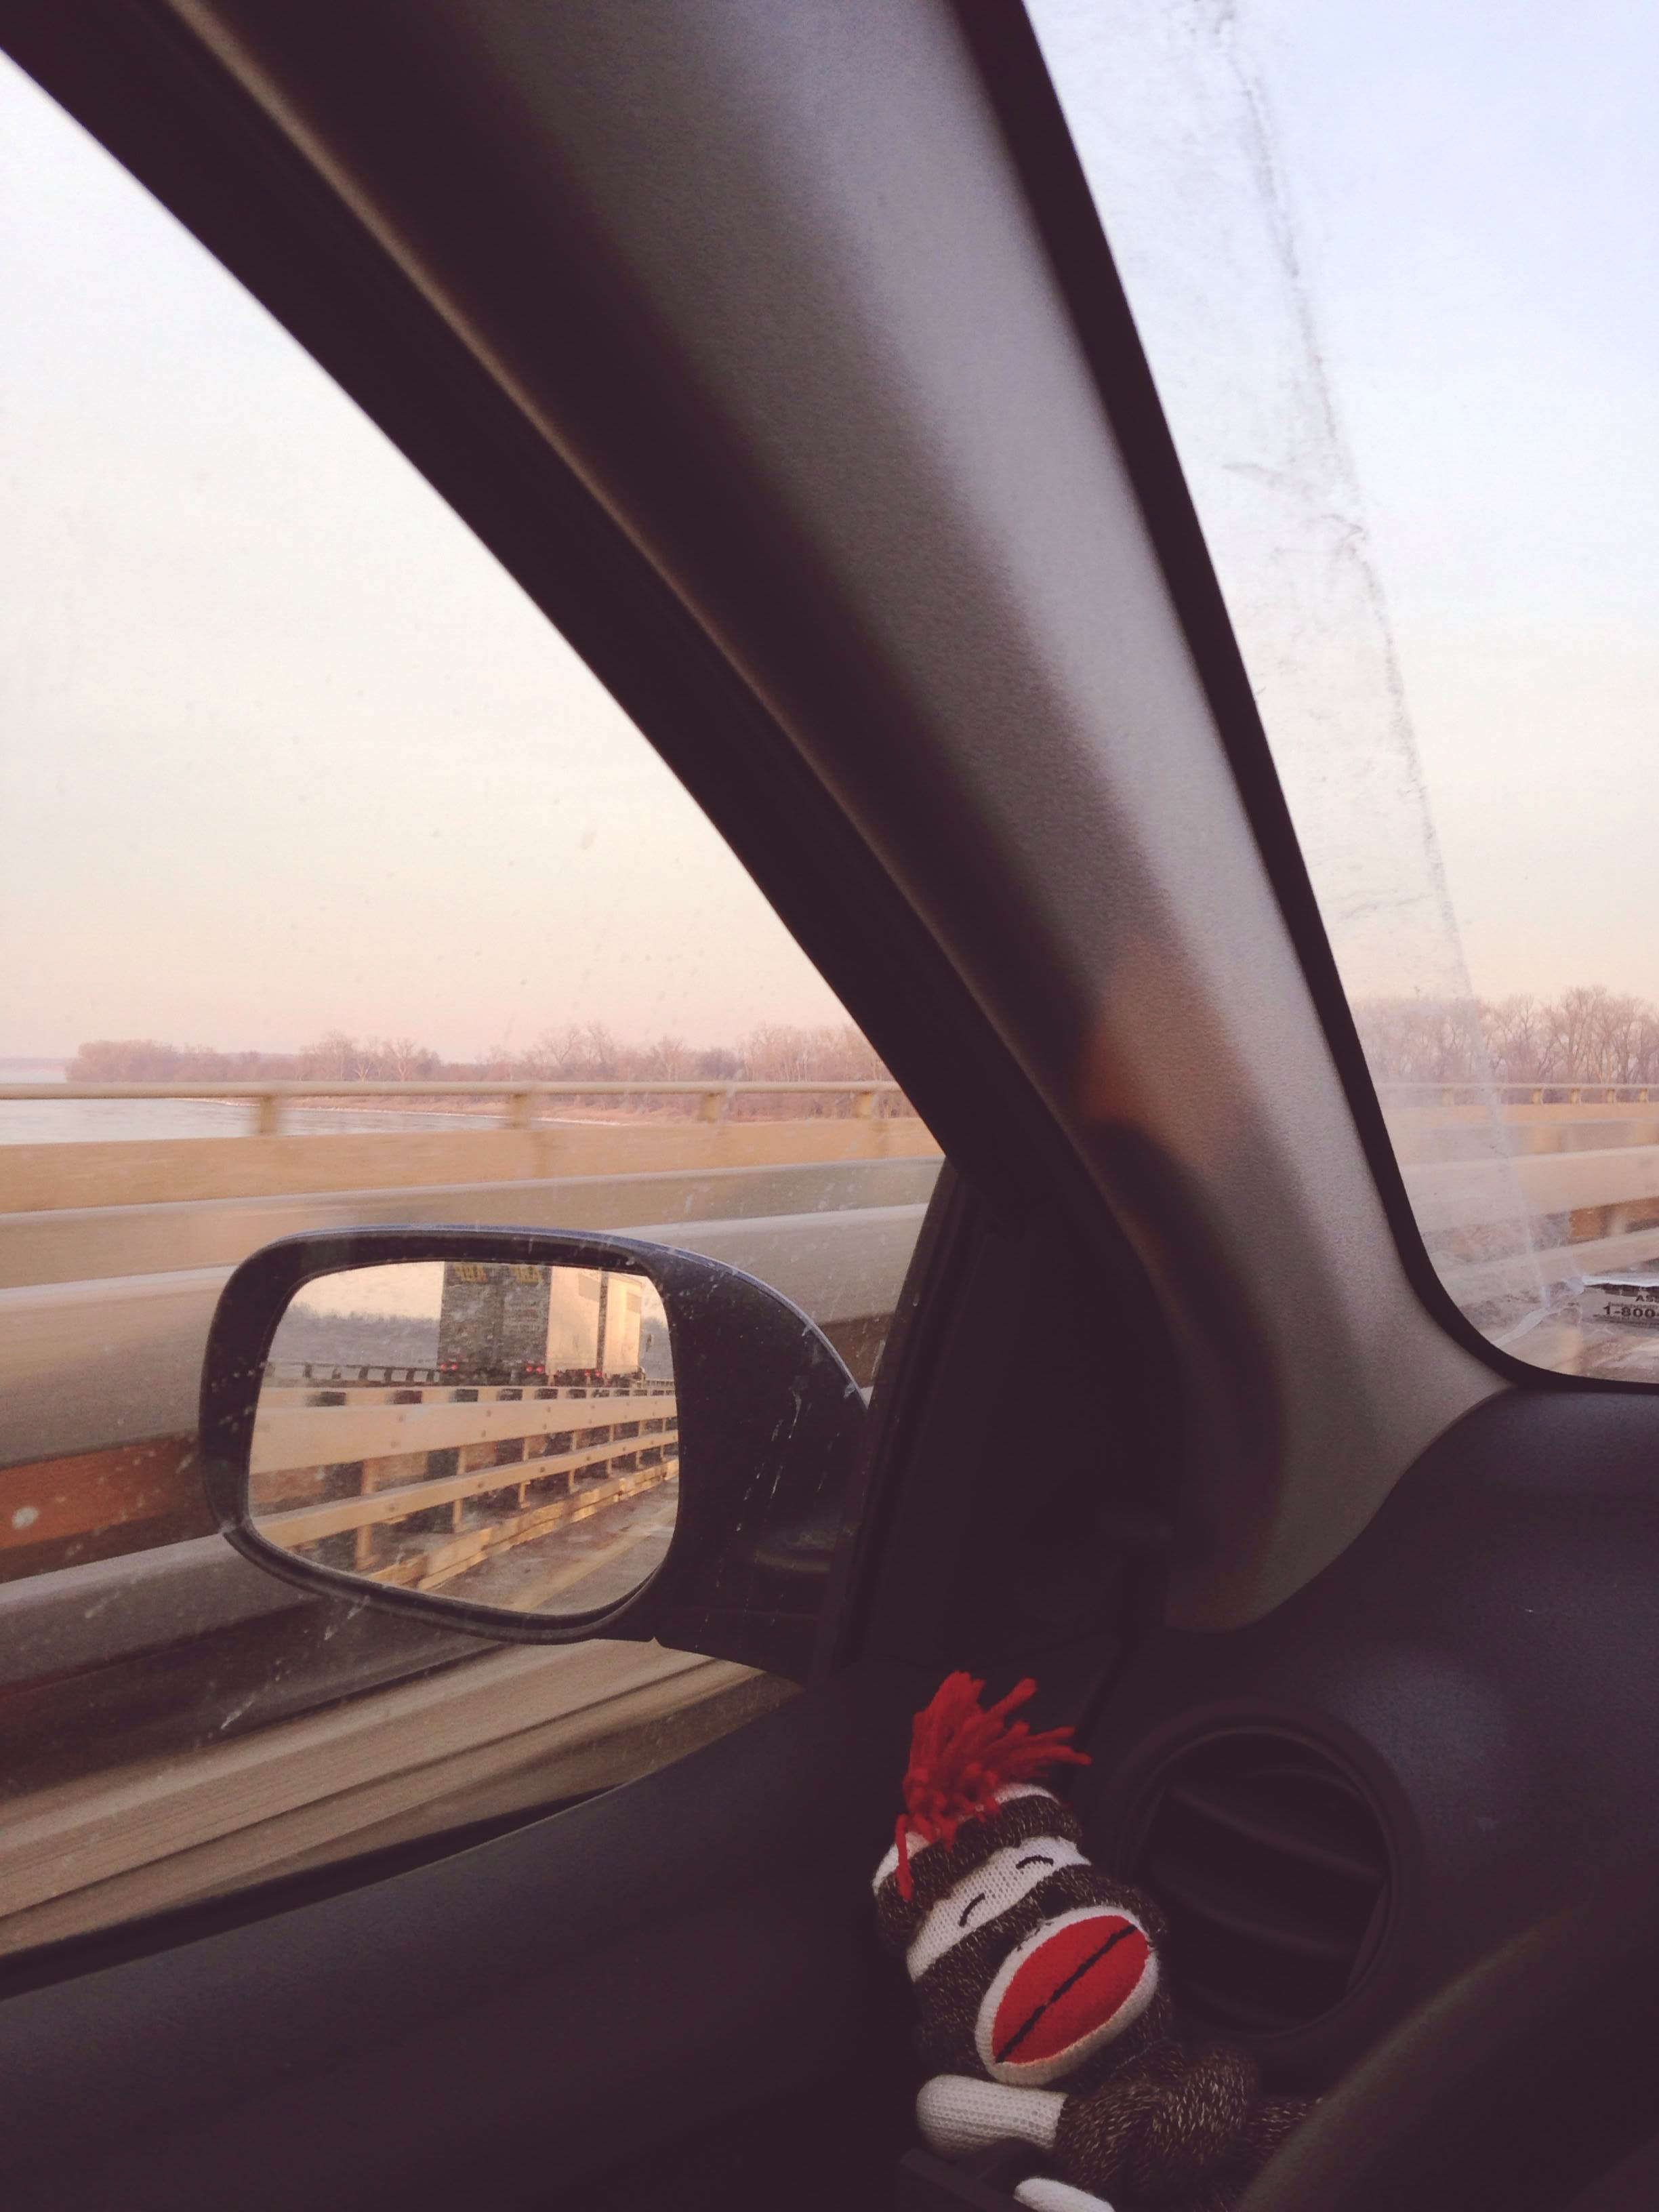 Wednesday around 5:30 I me and road companion crossed the bridge to Illinois to start the journey.